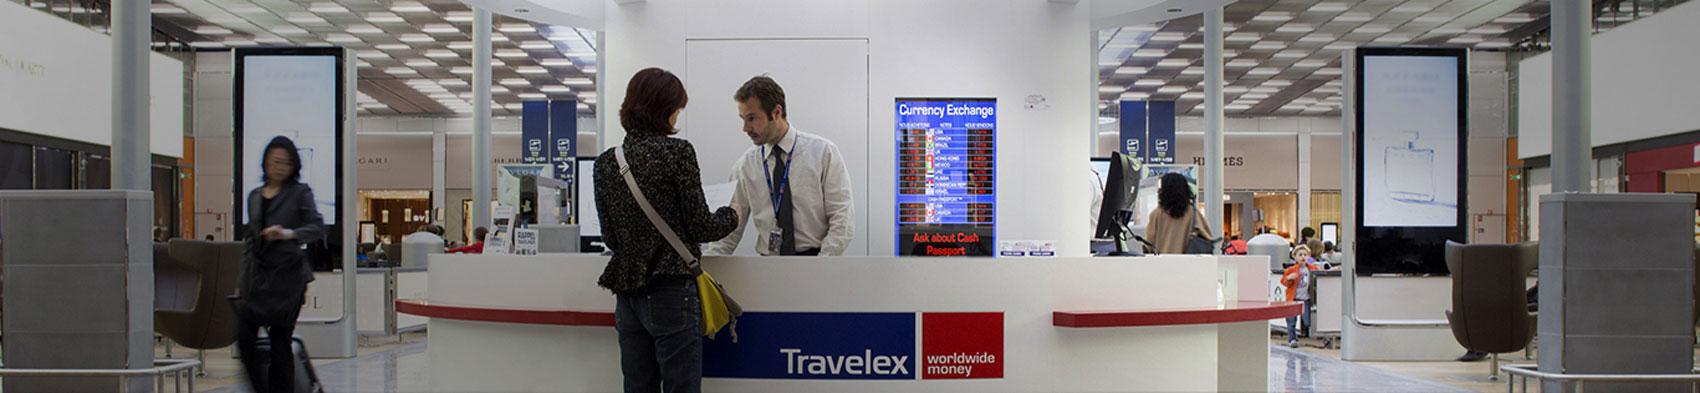 financial services paris aeroport roissy orly